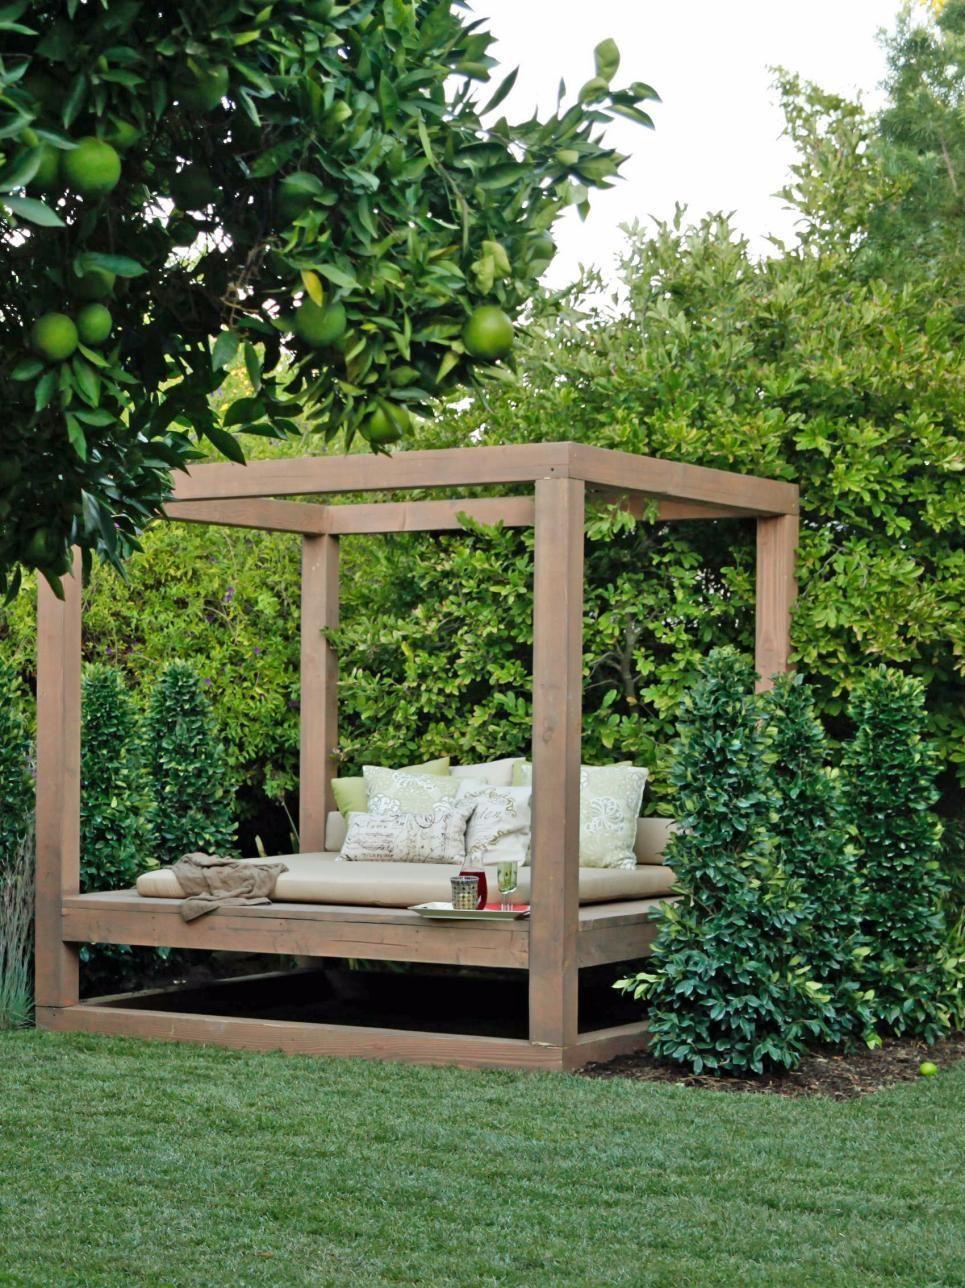 Garden bed with trees  outdoor bed hgtv  Life is a garden dig it  Pinterest  Outdoor